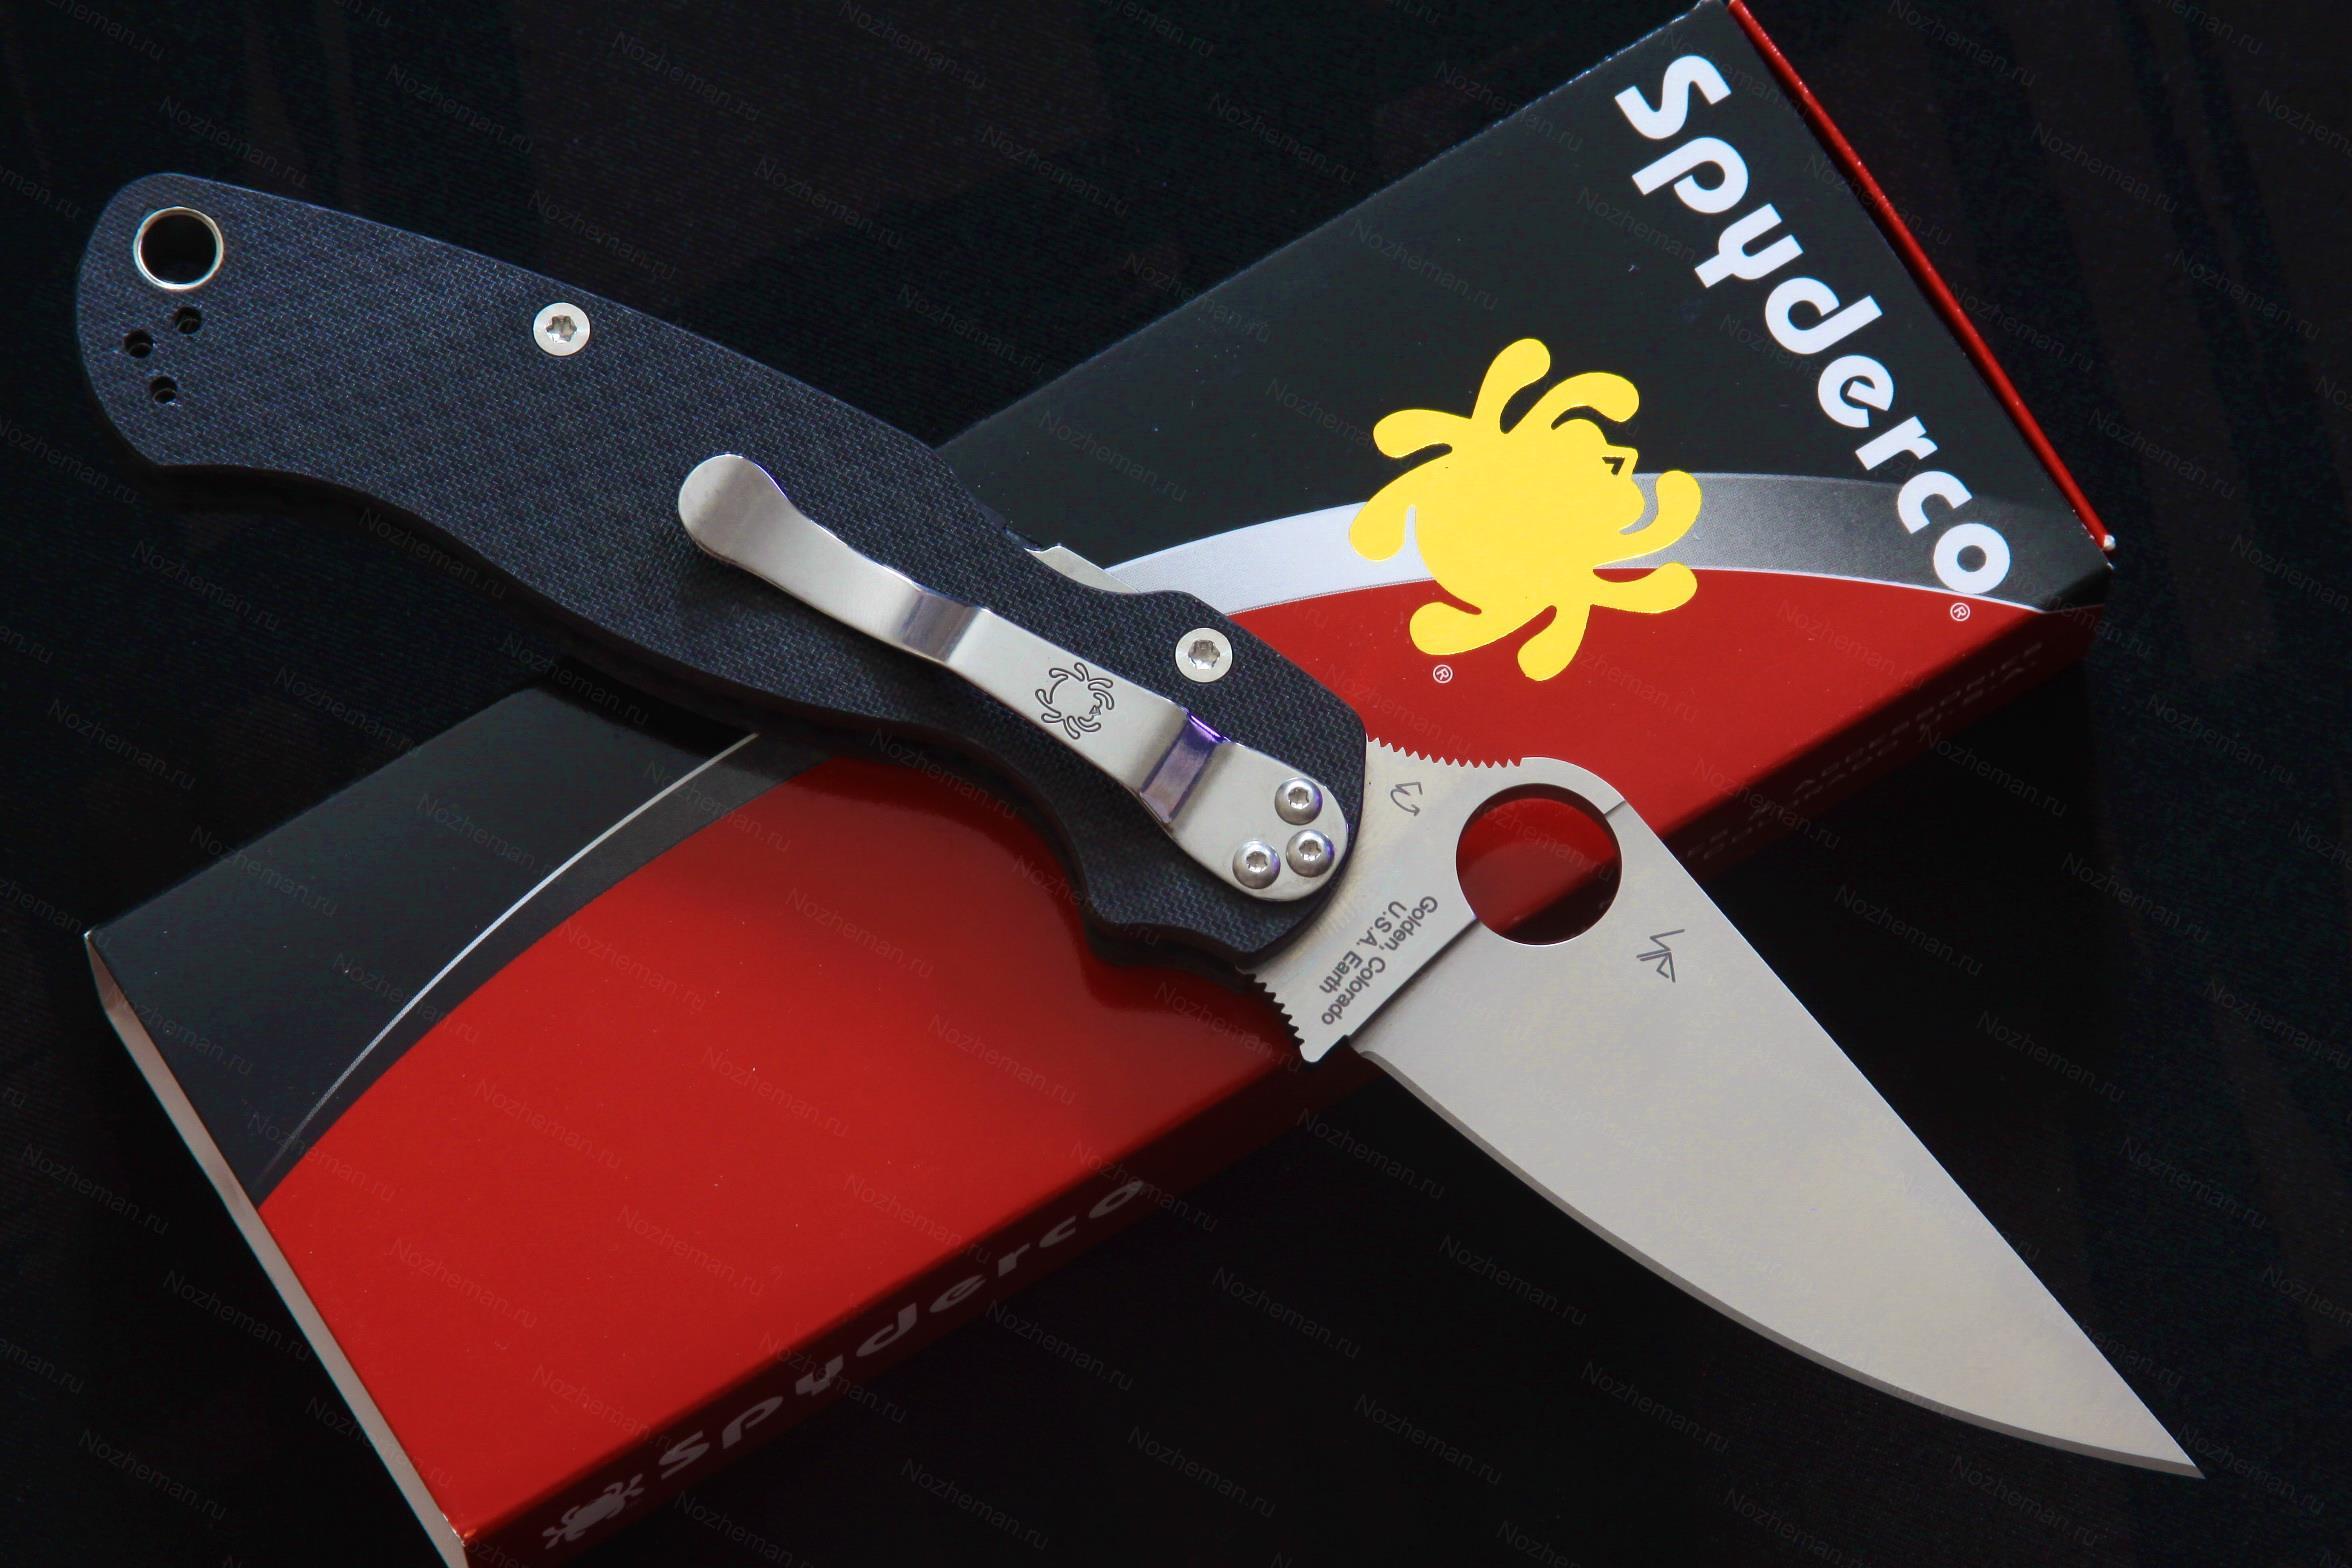 Spyderco Paramilitary 2 M4 Carbon Fiber Knifeworks Exclusive